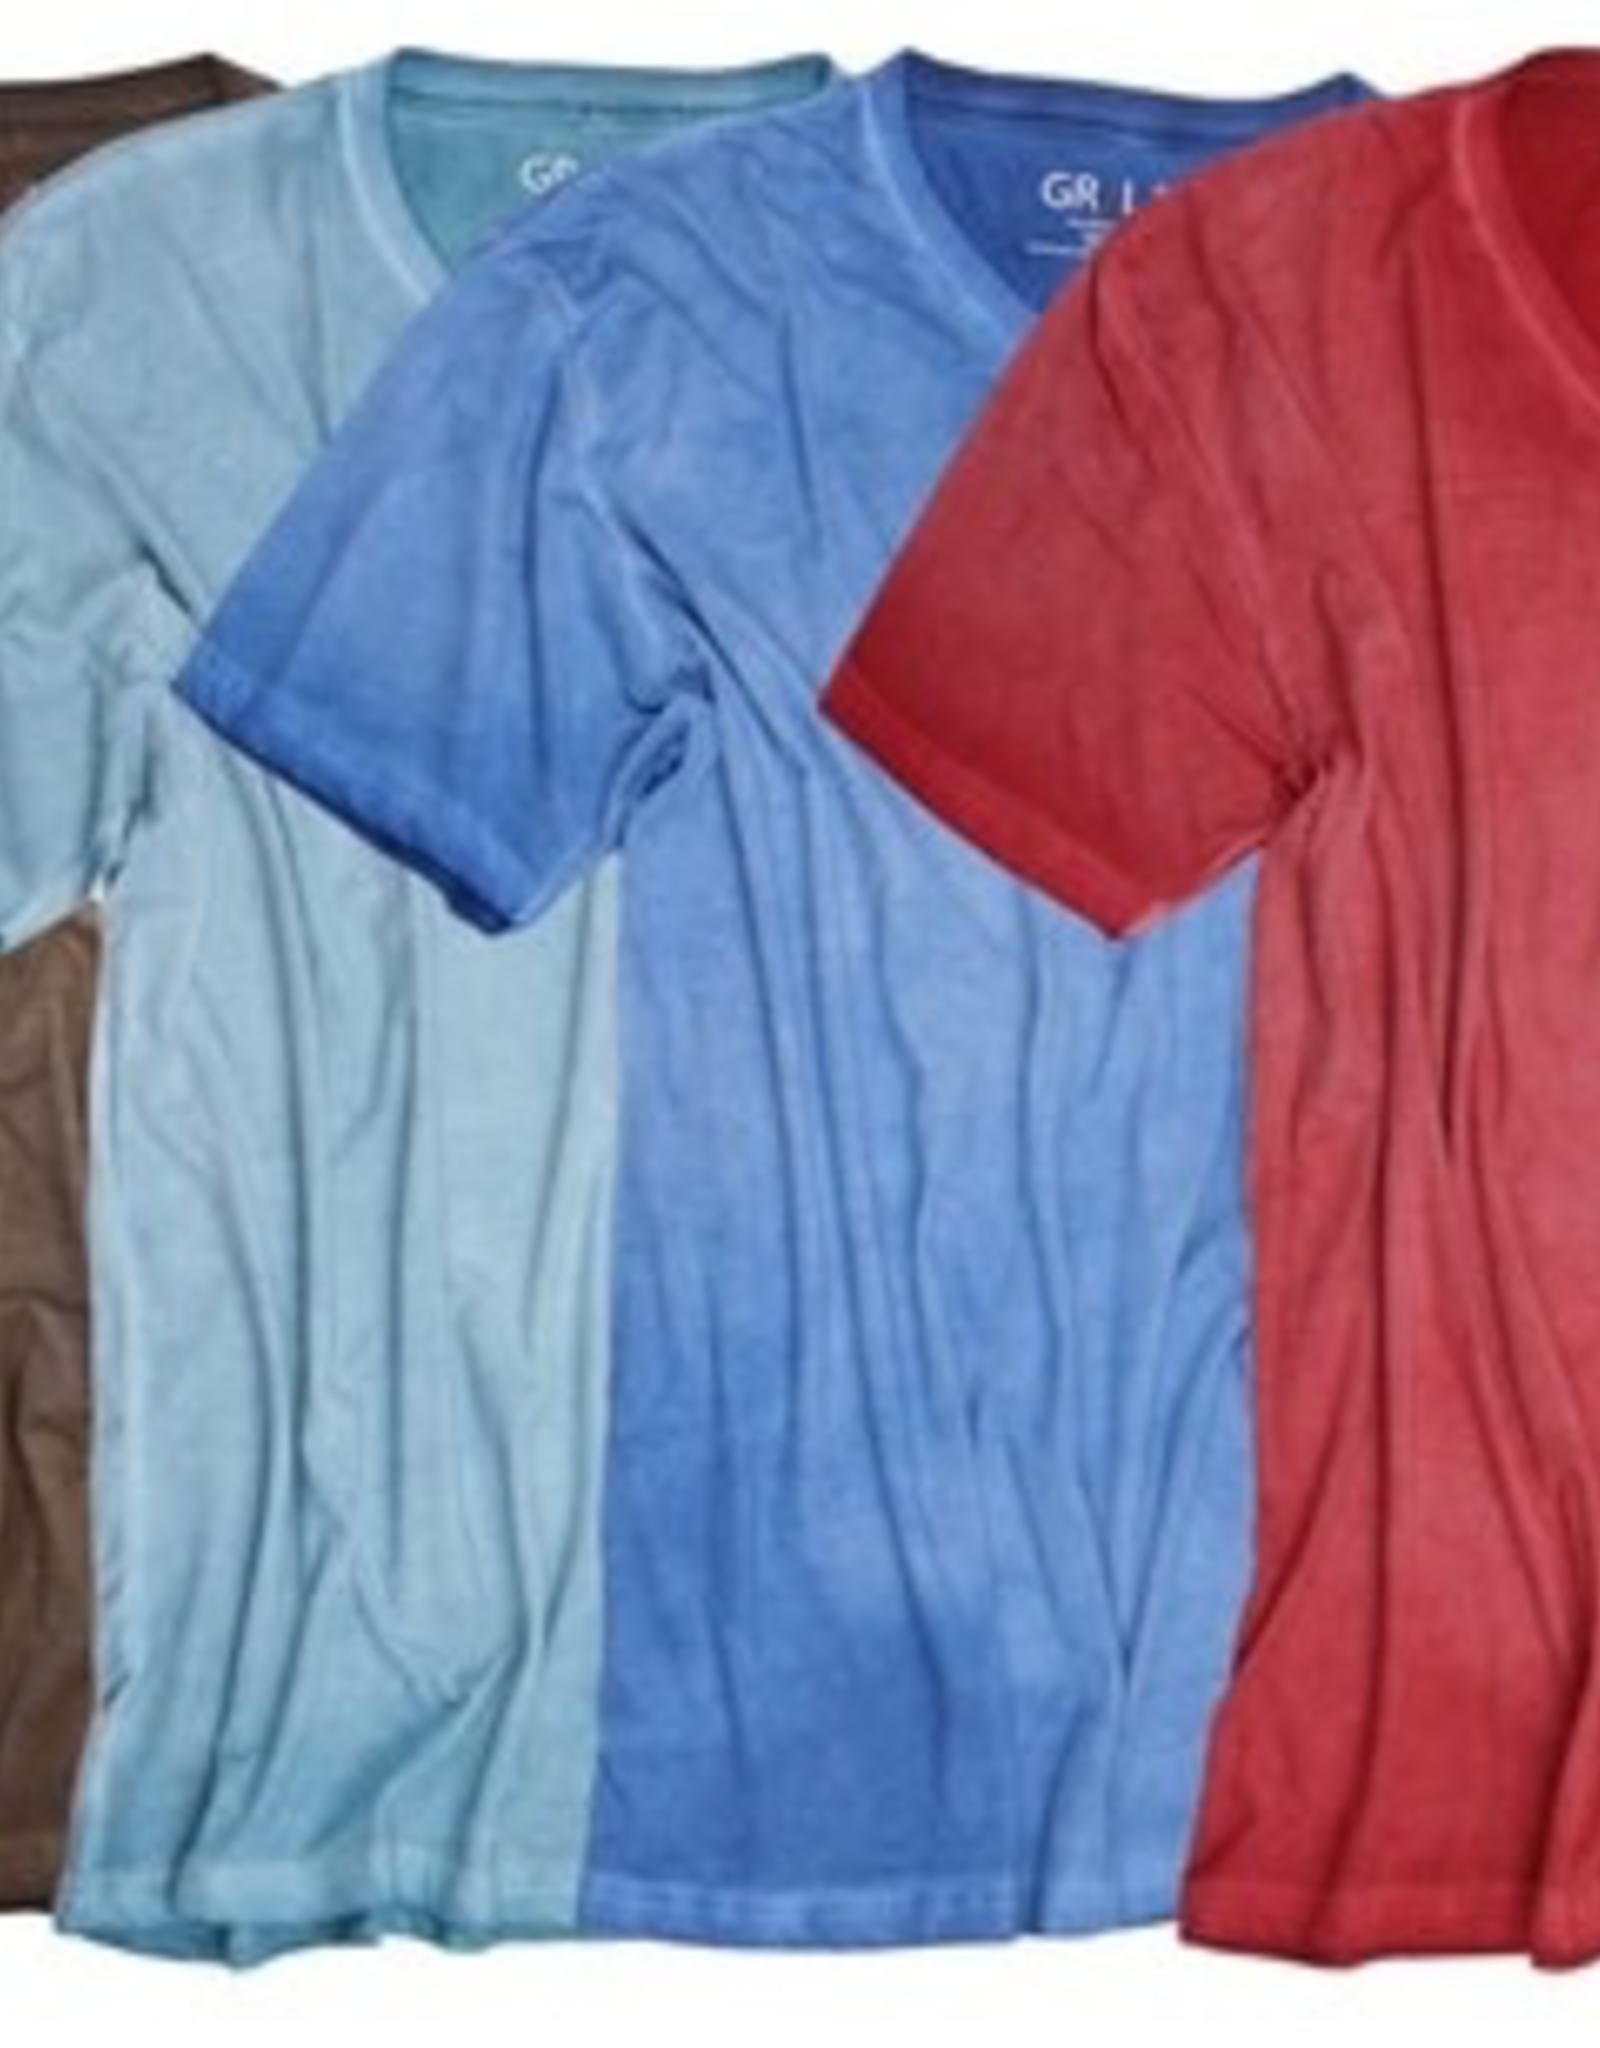 Georg Roth V-Neck Short Sleeves Garment Dyed T-Shirt